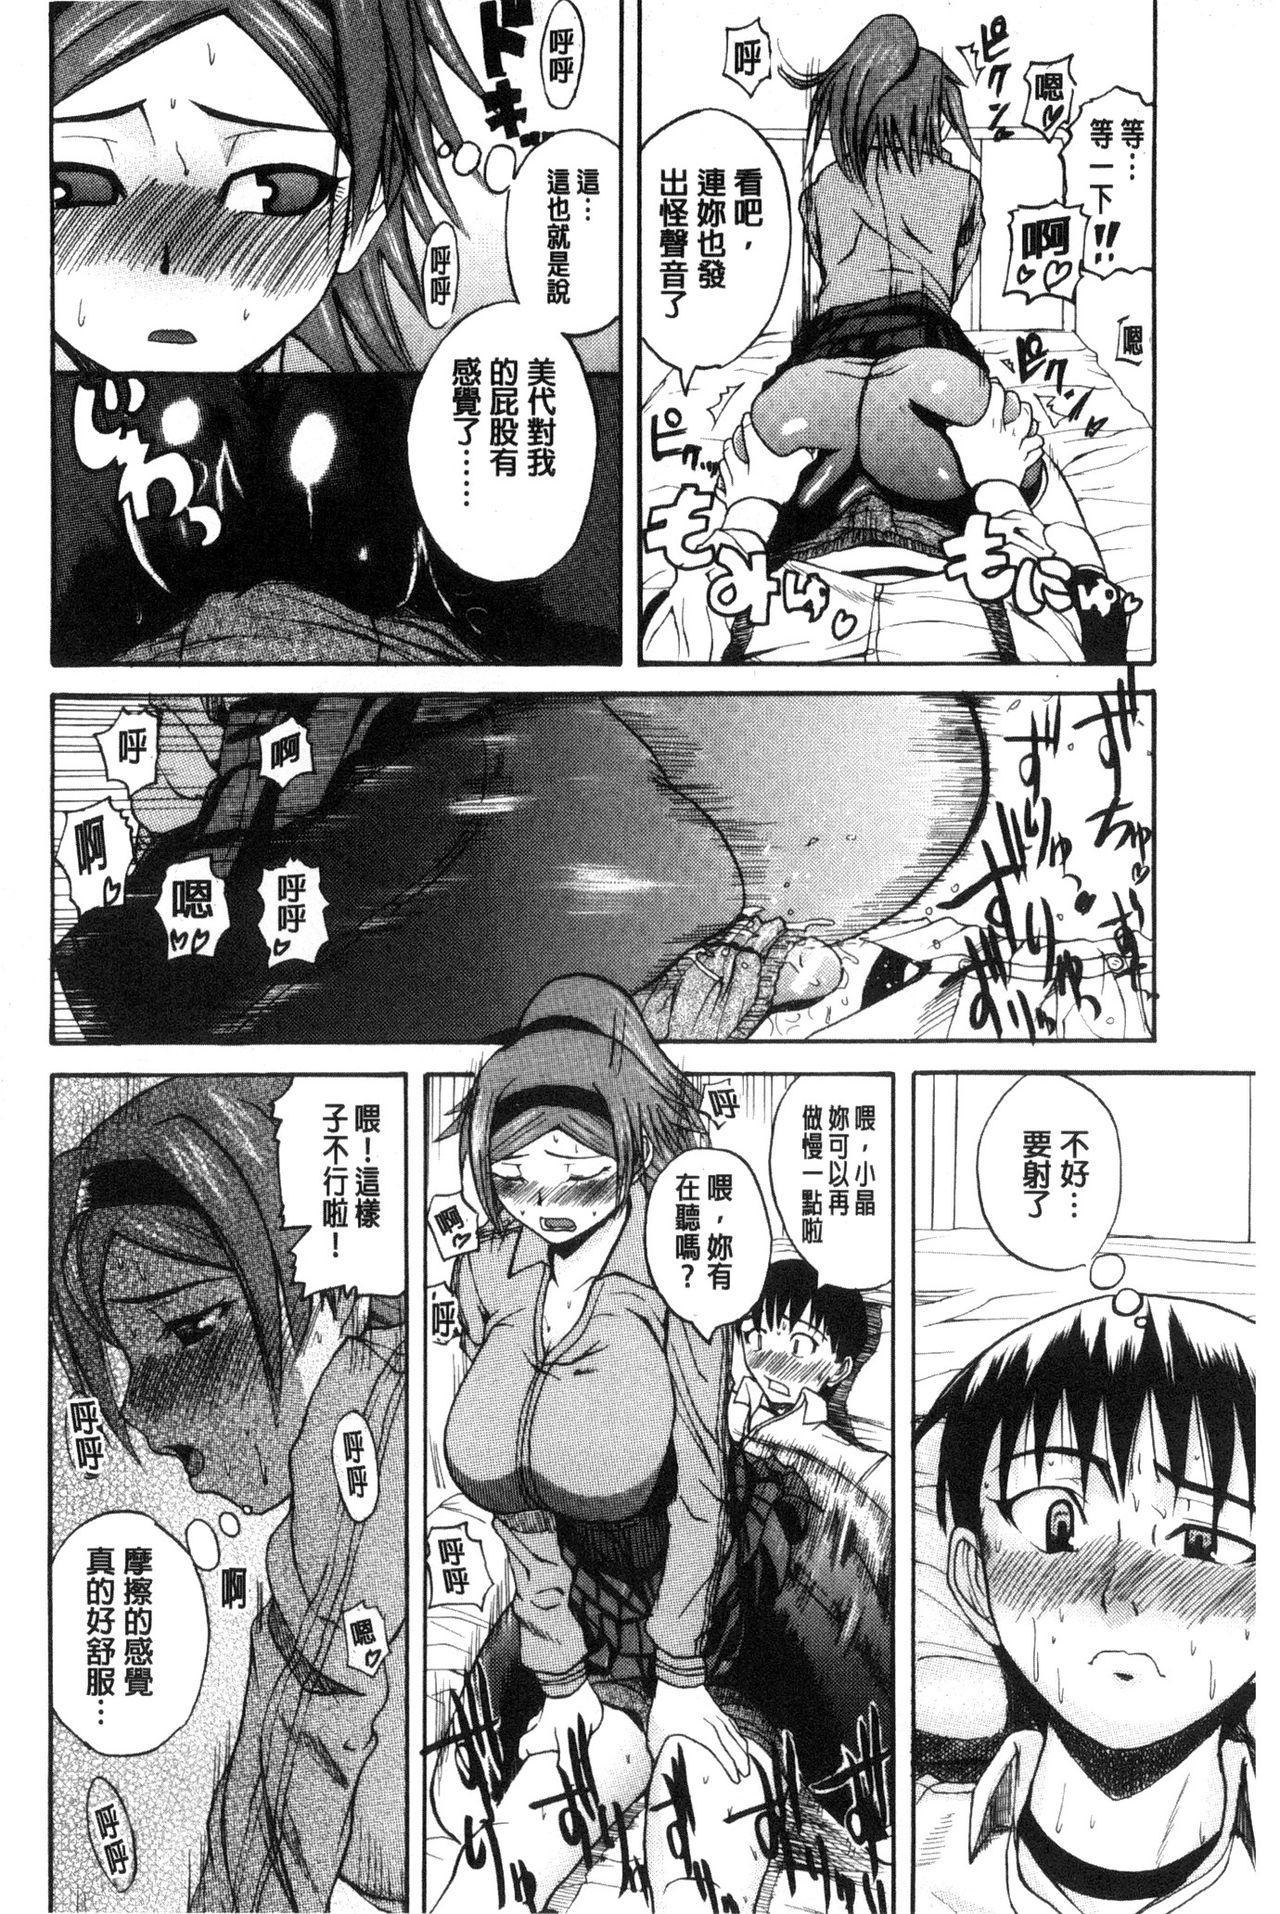 Opink Health Seibo no Fukuin 196